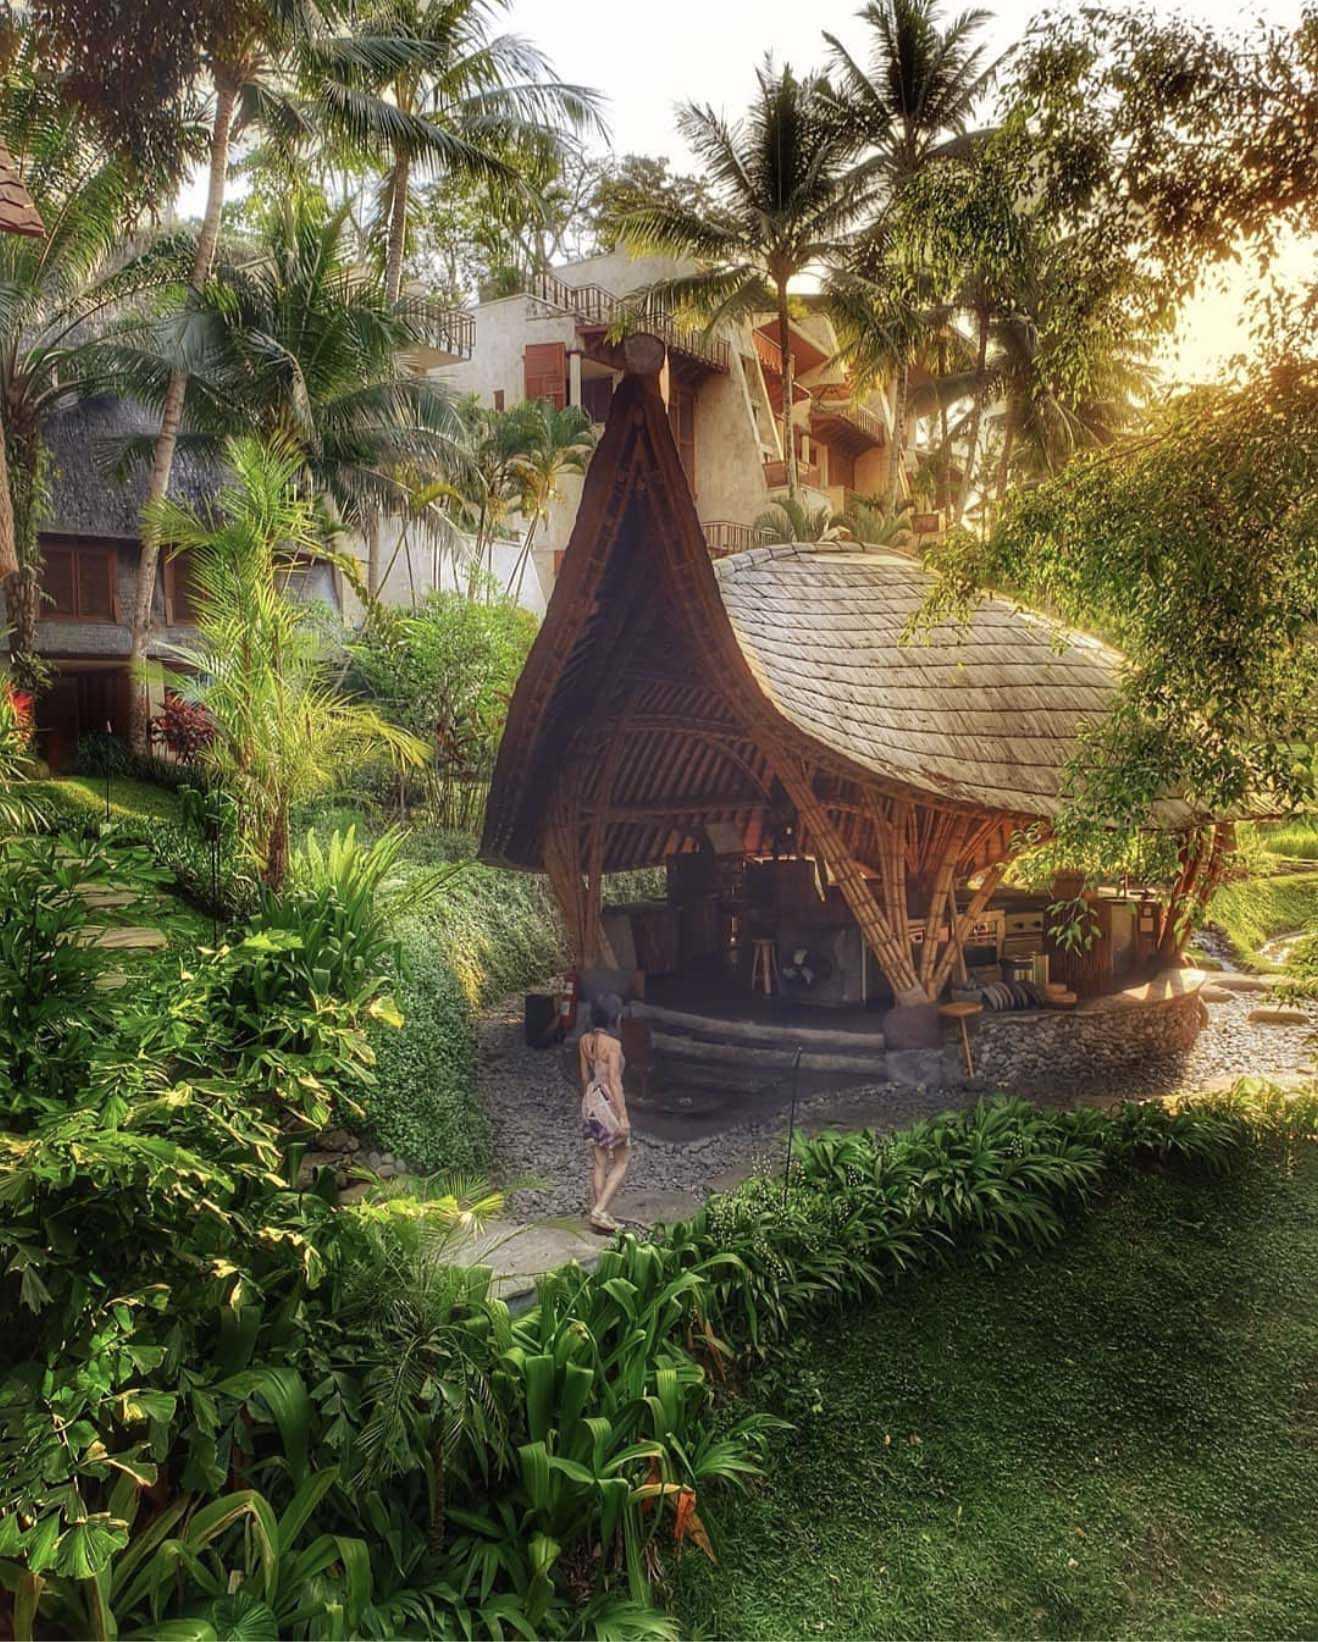 Agung Budi Raharsa | Architecture & Engineering Sokasi Bamboo Cooking Class / School - Bali Bali, Indonesia Bali, Indonesia Agung-Budi-Raharsa-Sokasi-Cooking-Class-School-Bali  88750